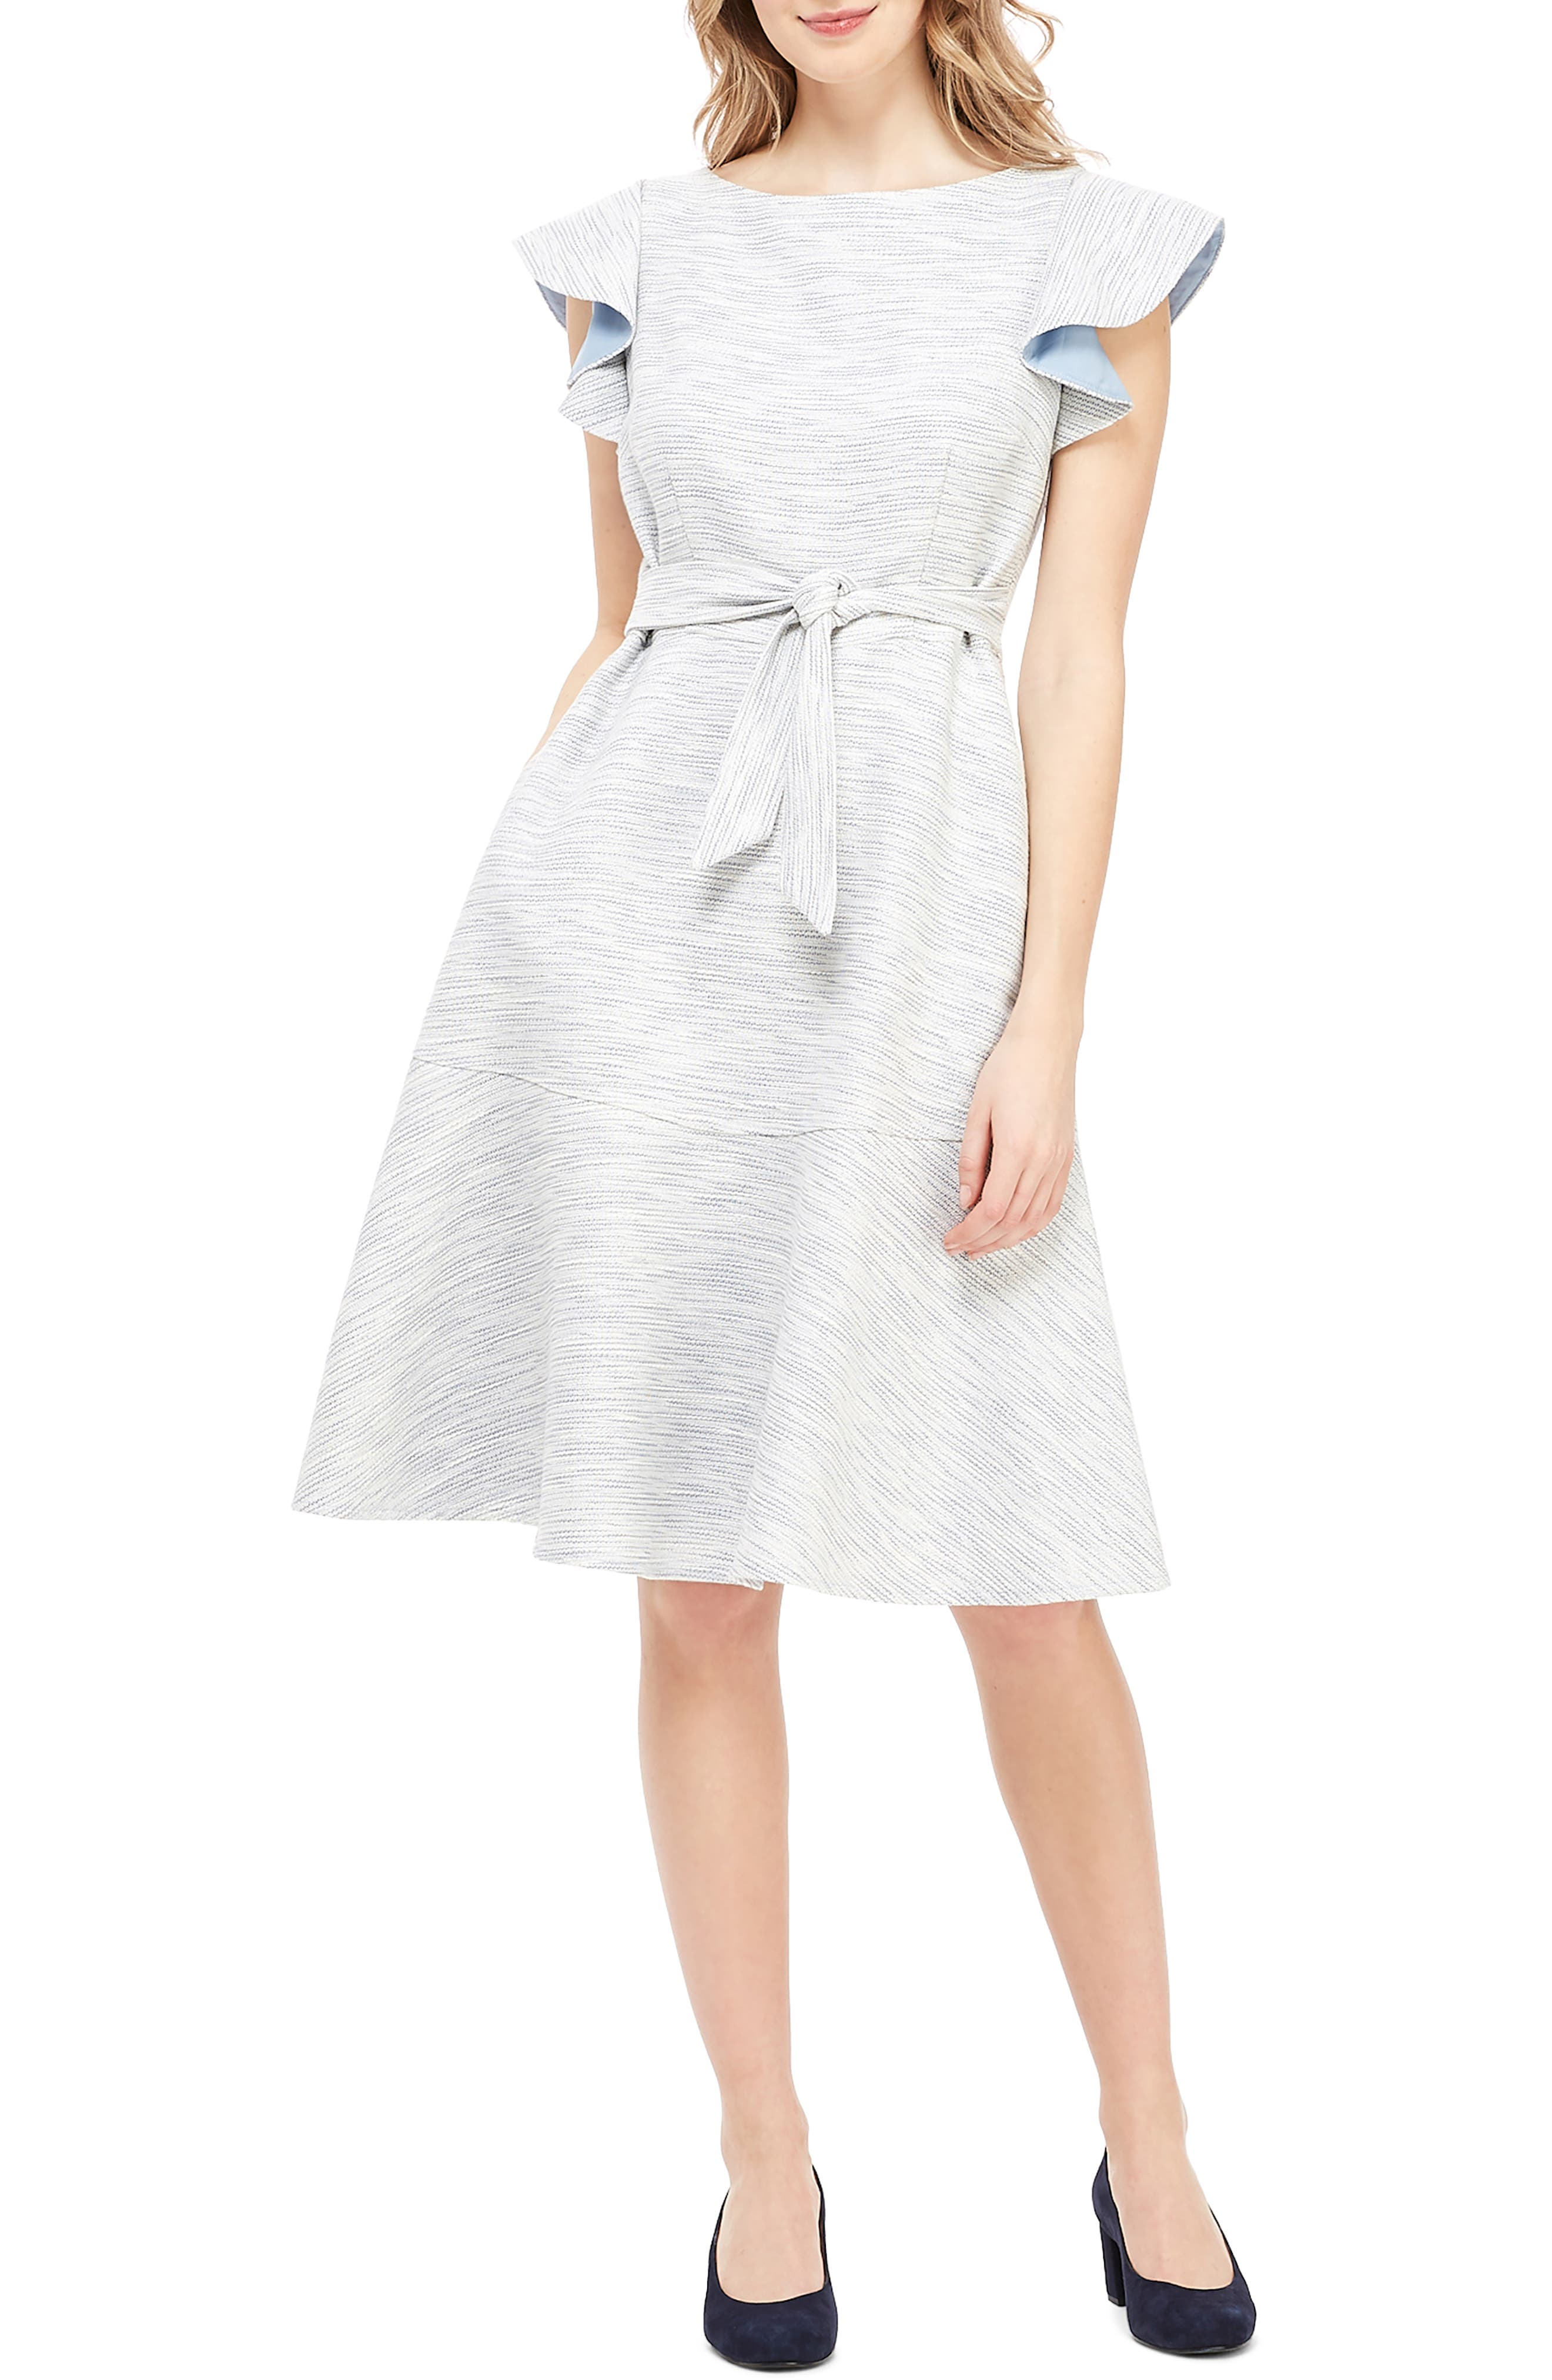 Gal Meets Glam Collection Daniela Circular A-Line Dress, Blue